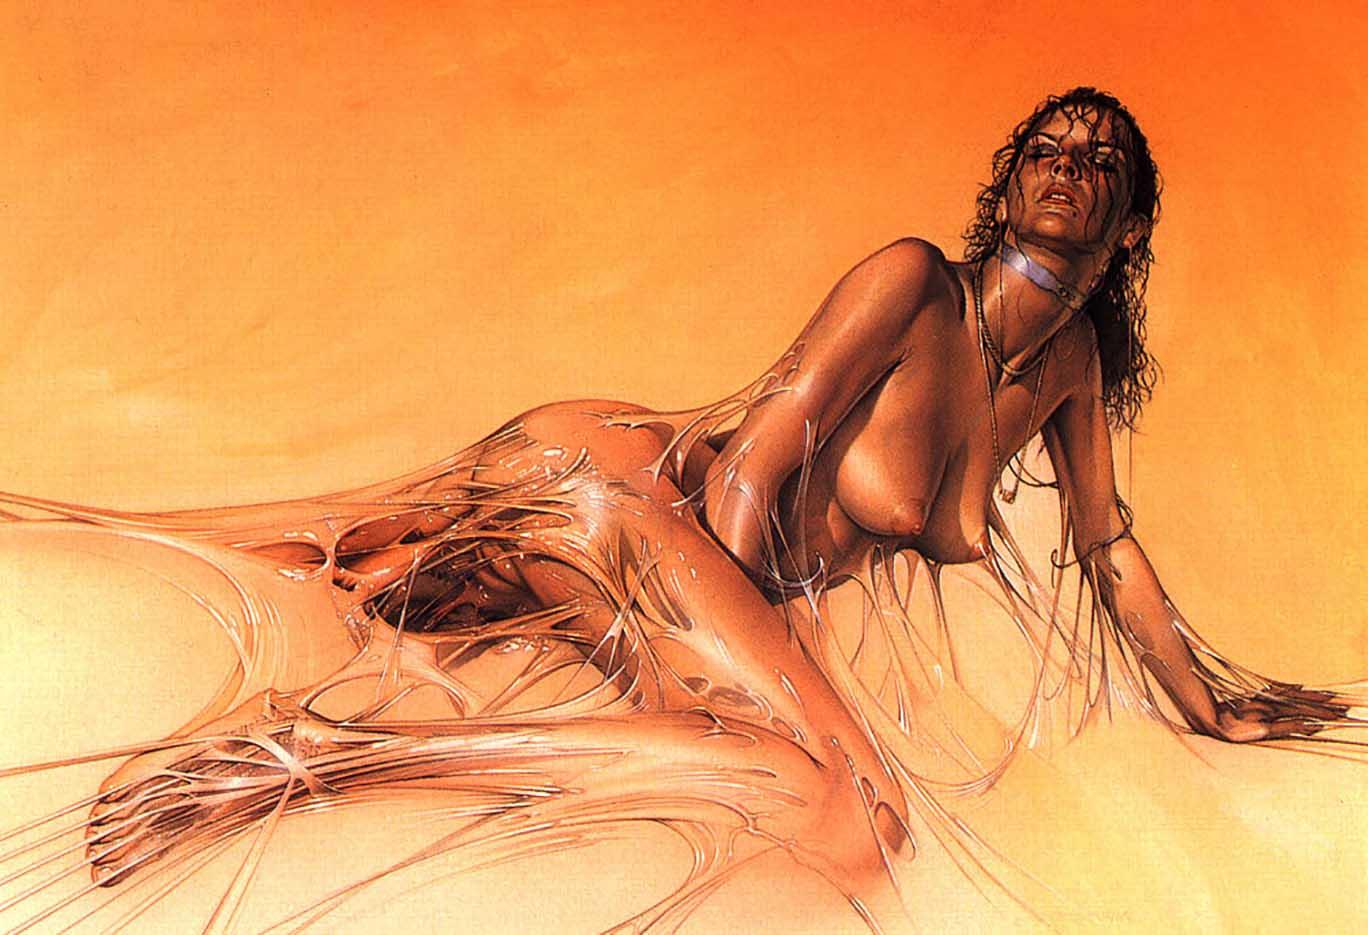 sex-girl-nude-fantasy-art